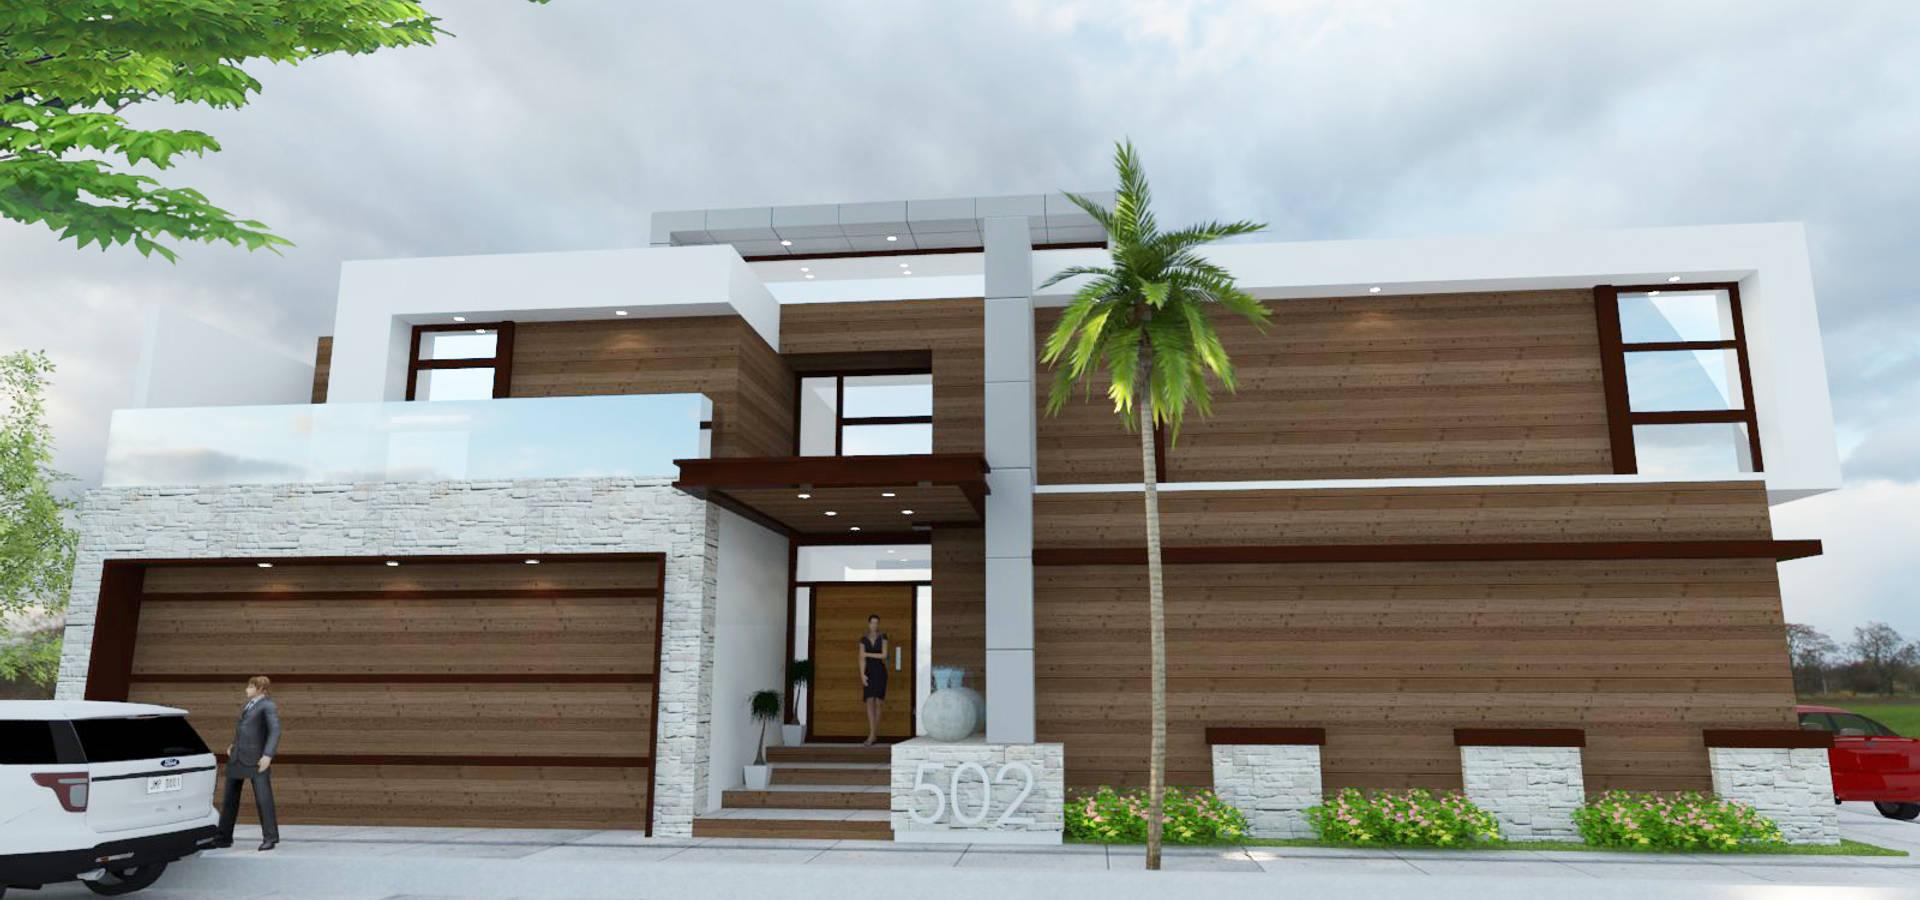 AE Arquitecto